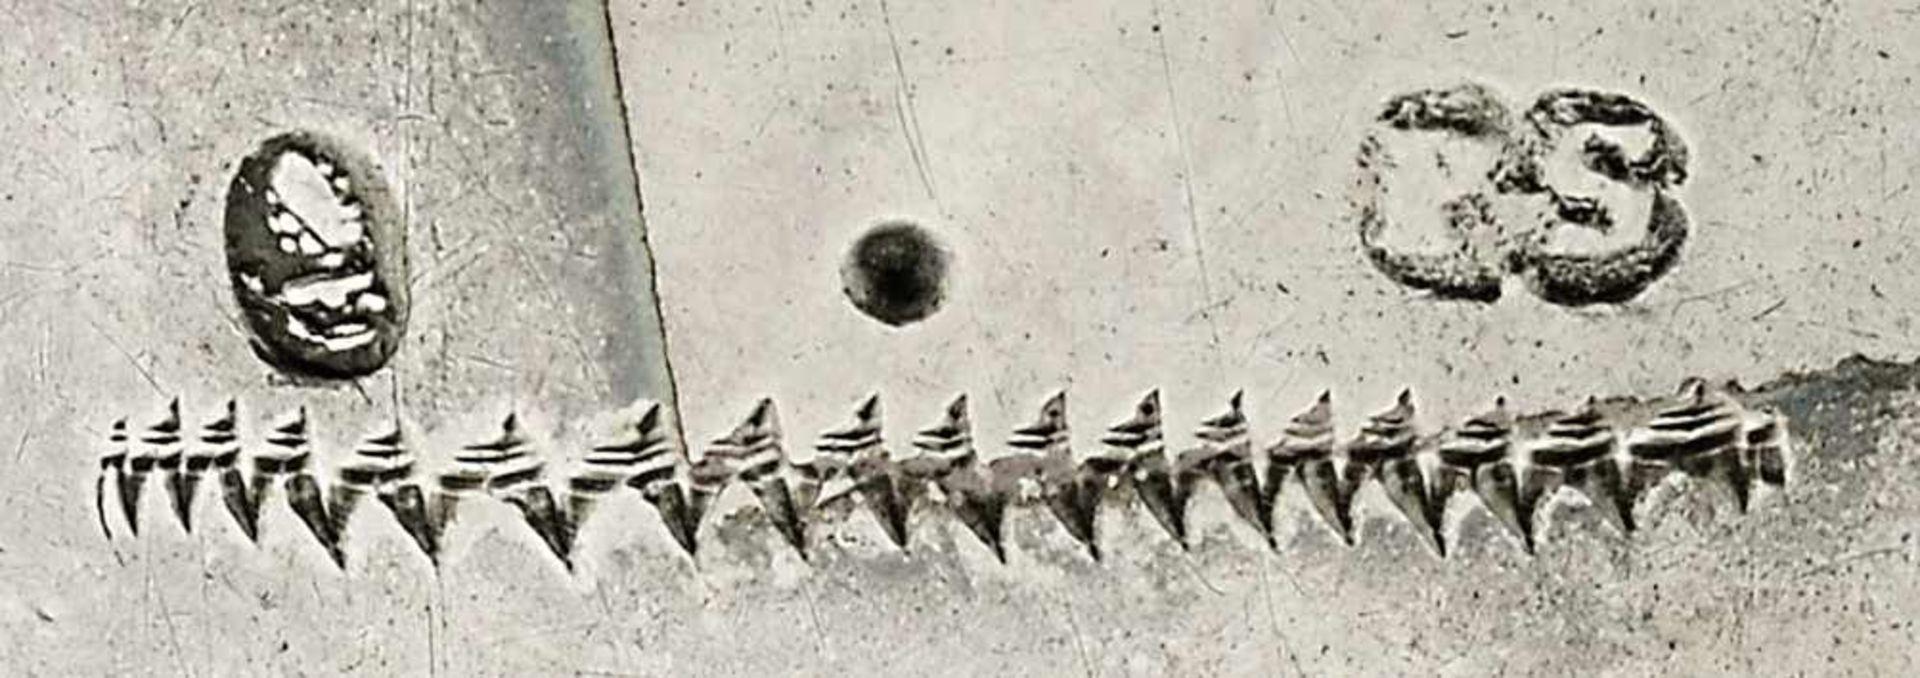 Kugelfußbecher< - Bild 2 aus 2